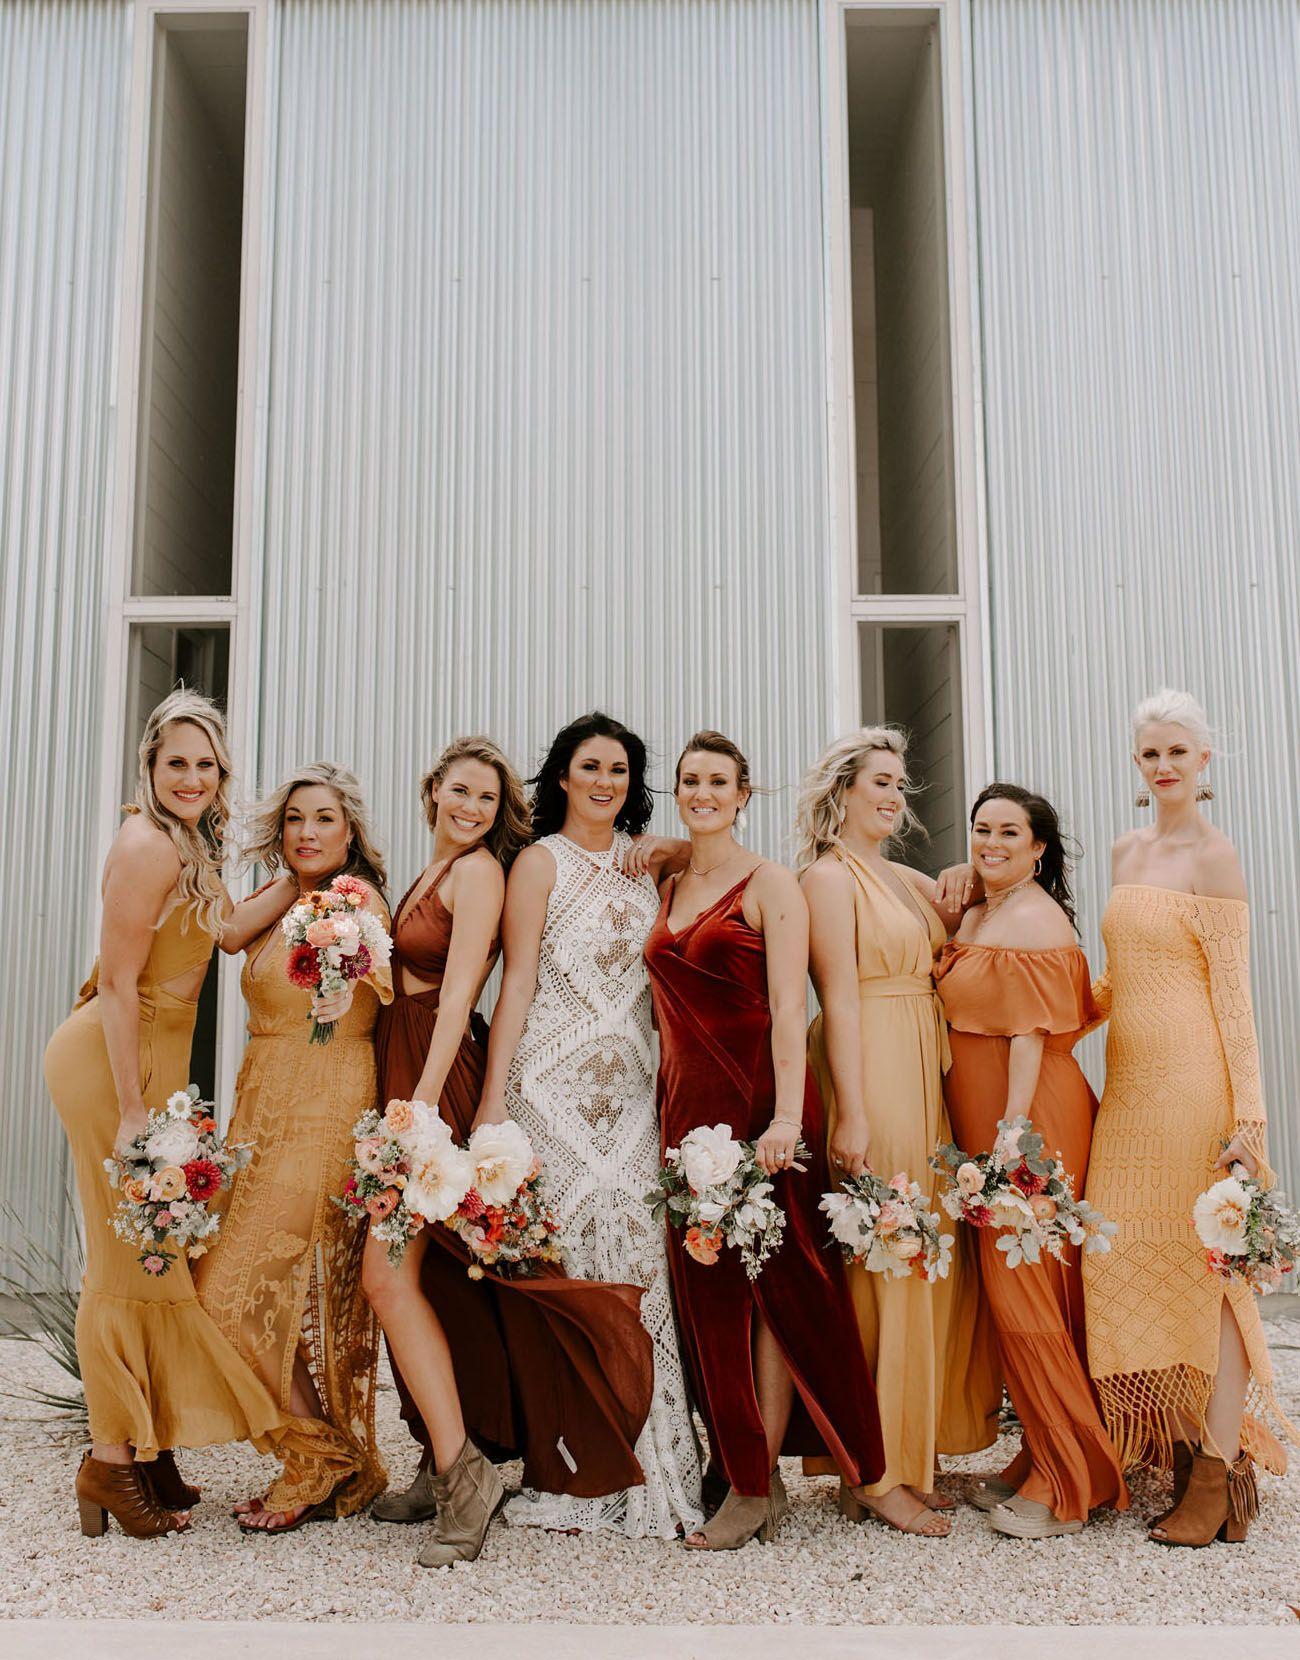 Amber Satin Chiffon Bridesmaid Dresses Orange Bridesmaid Dresses Summer Bridesmaid Dresses Fall Bridesmaid Dresses [ 1500 x 1000 Pixel ]